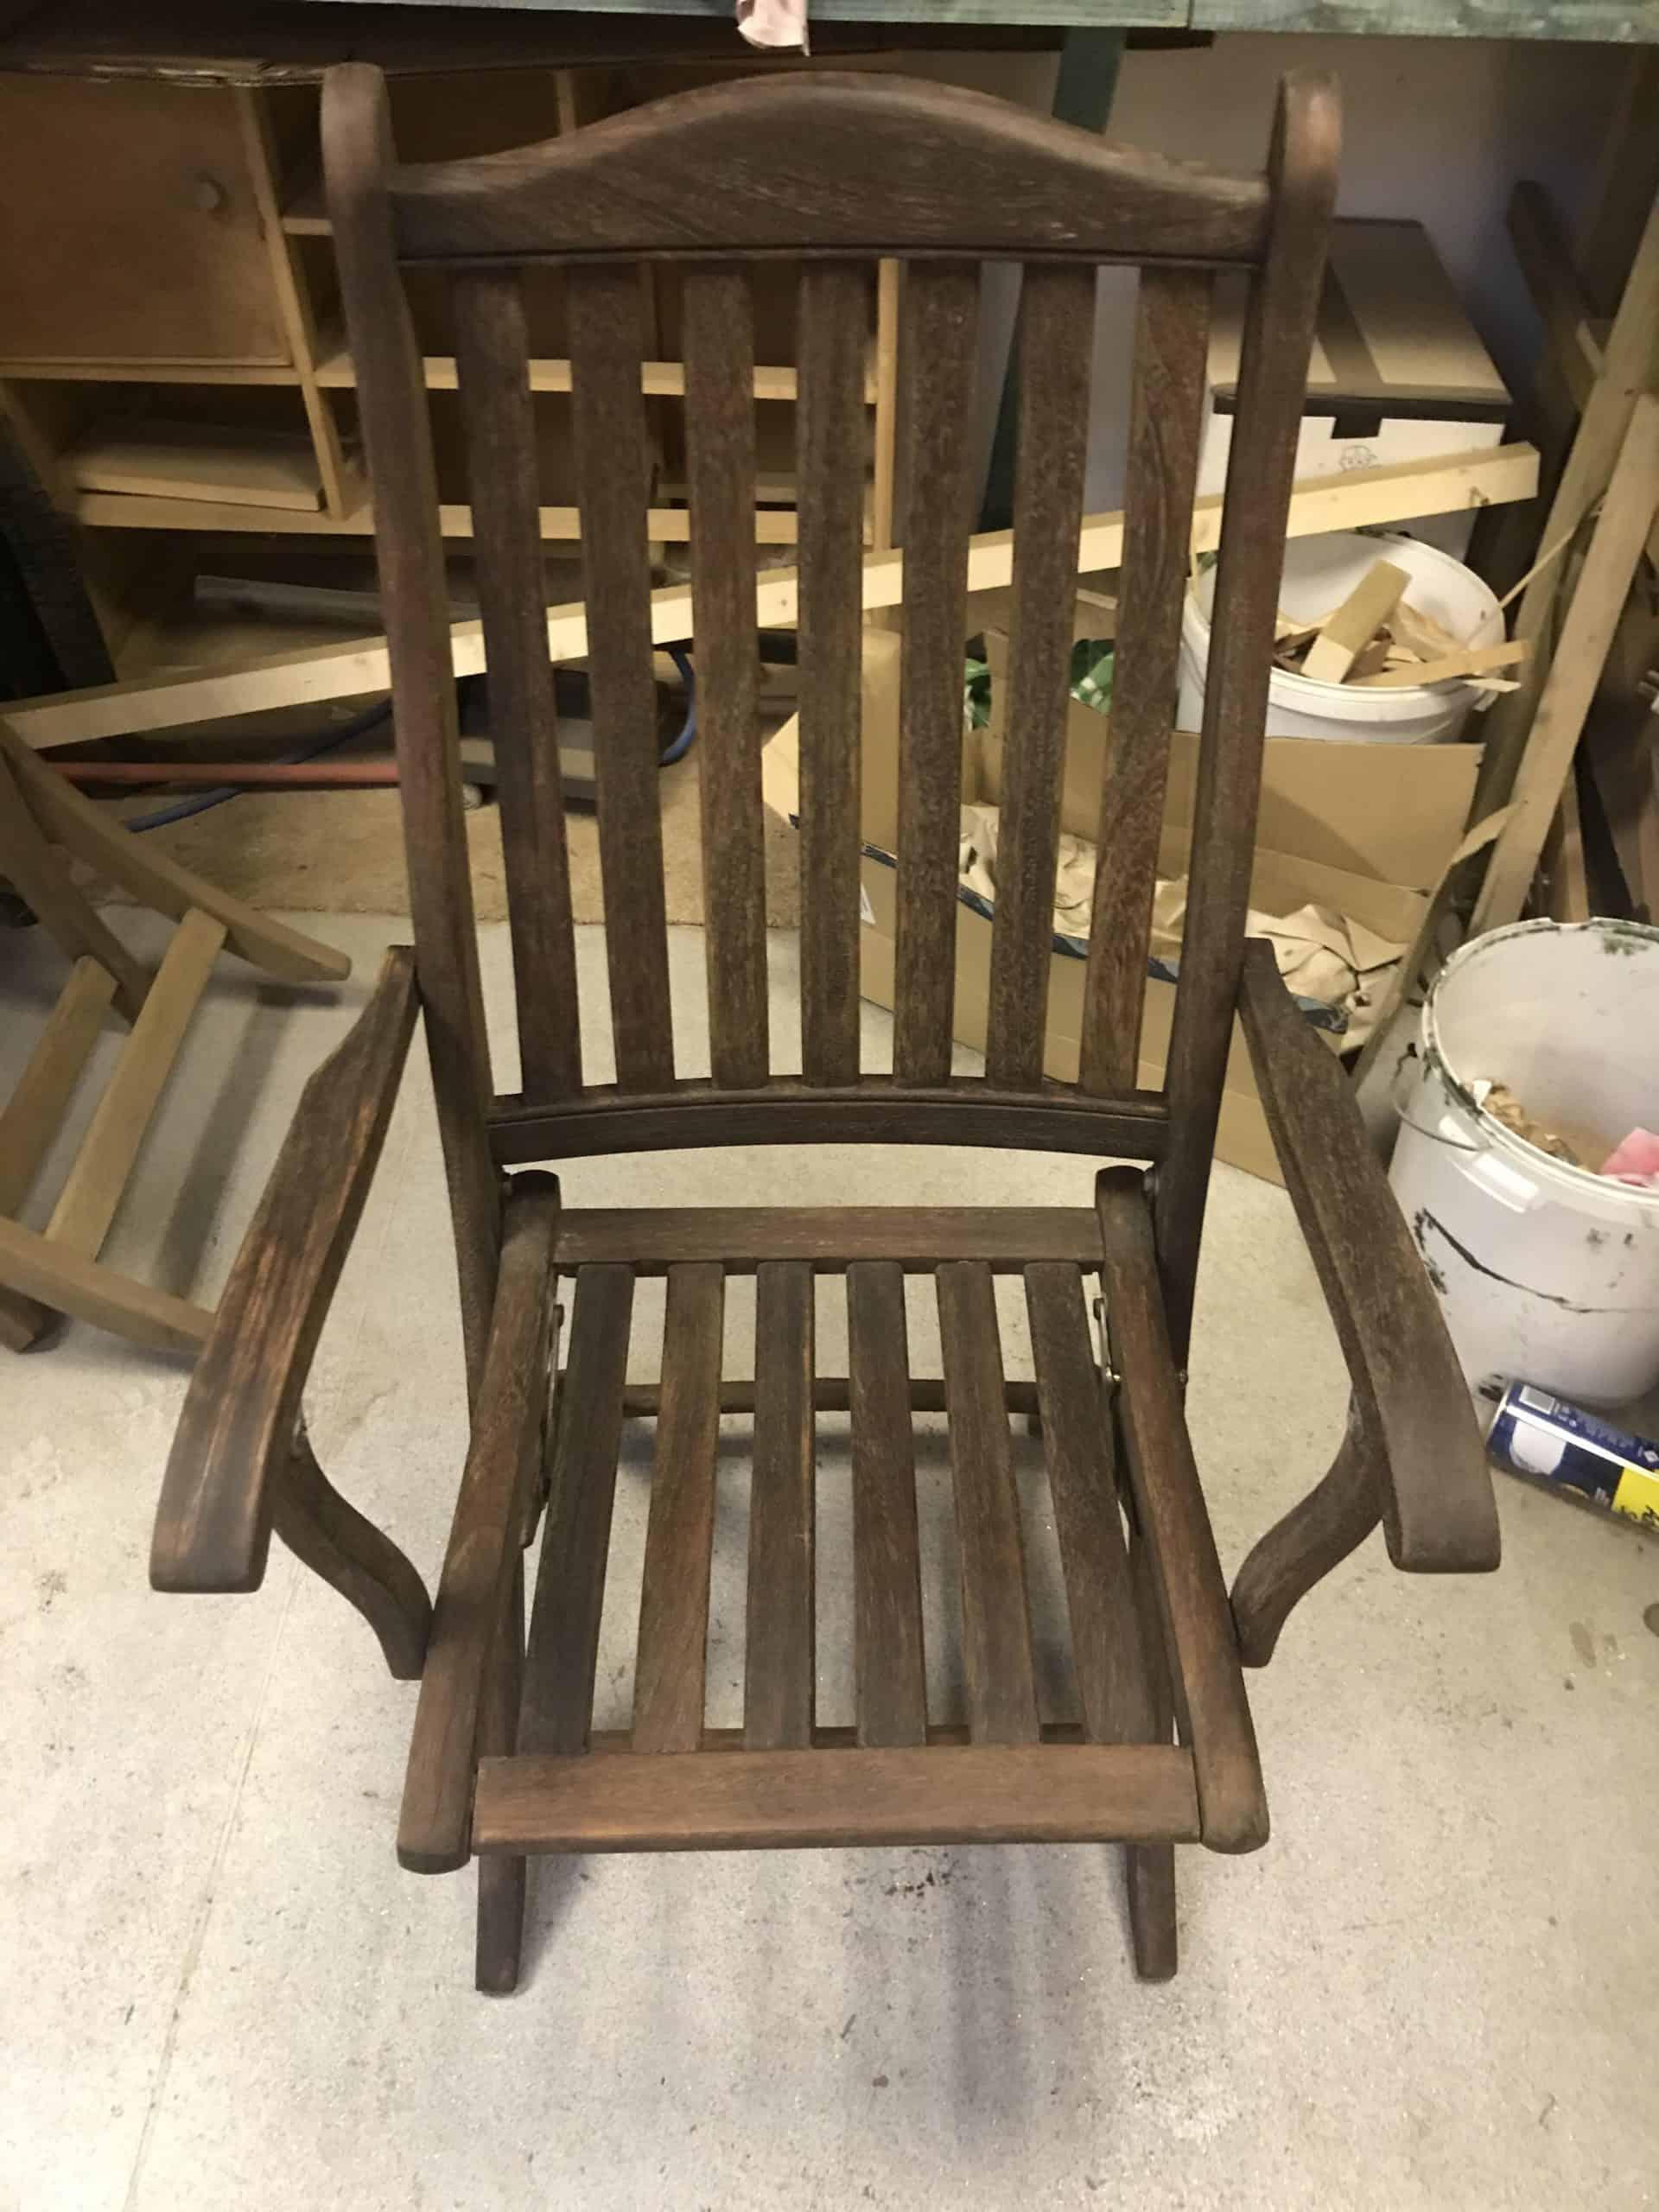 A Restored chair